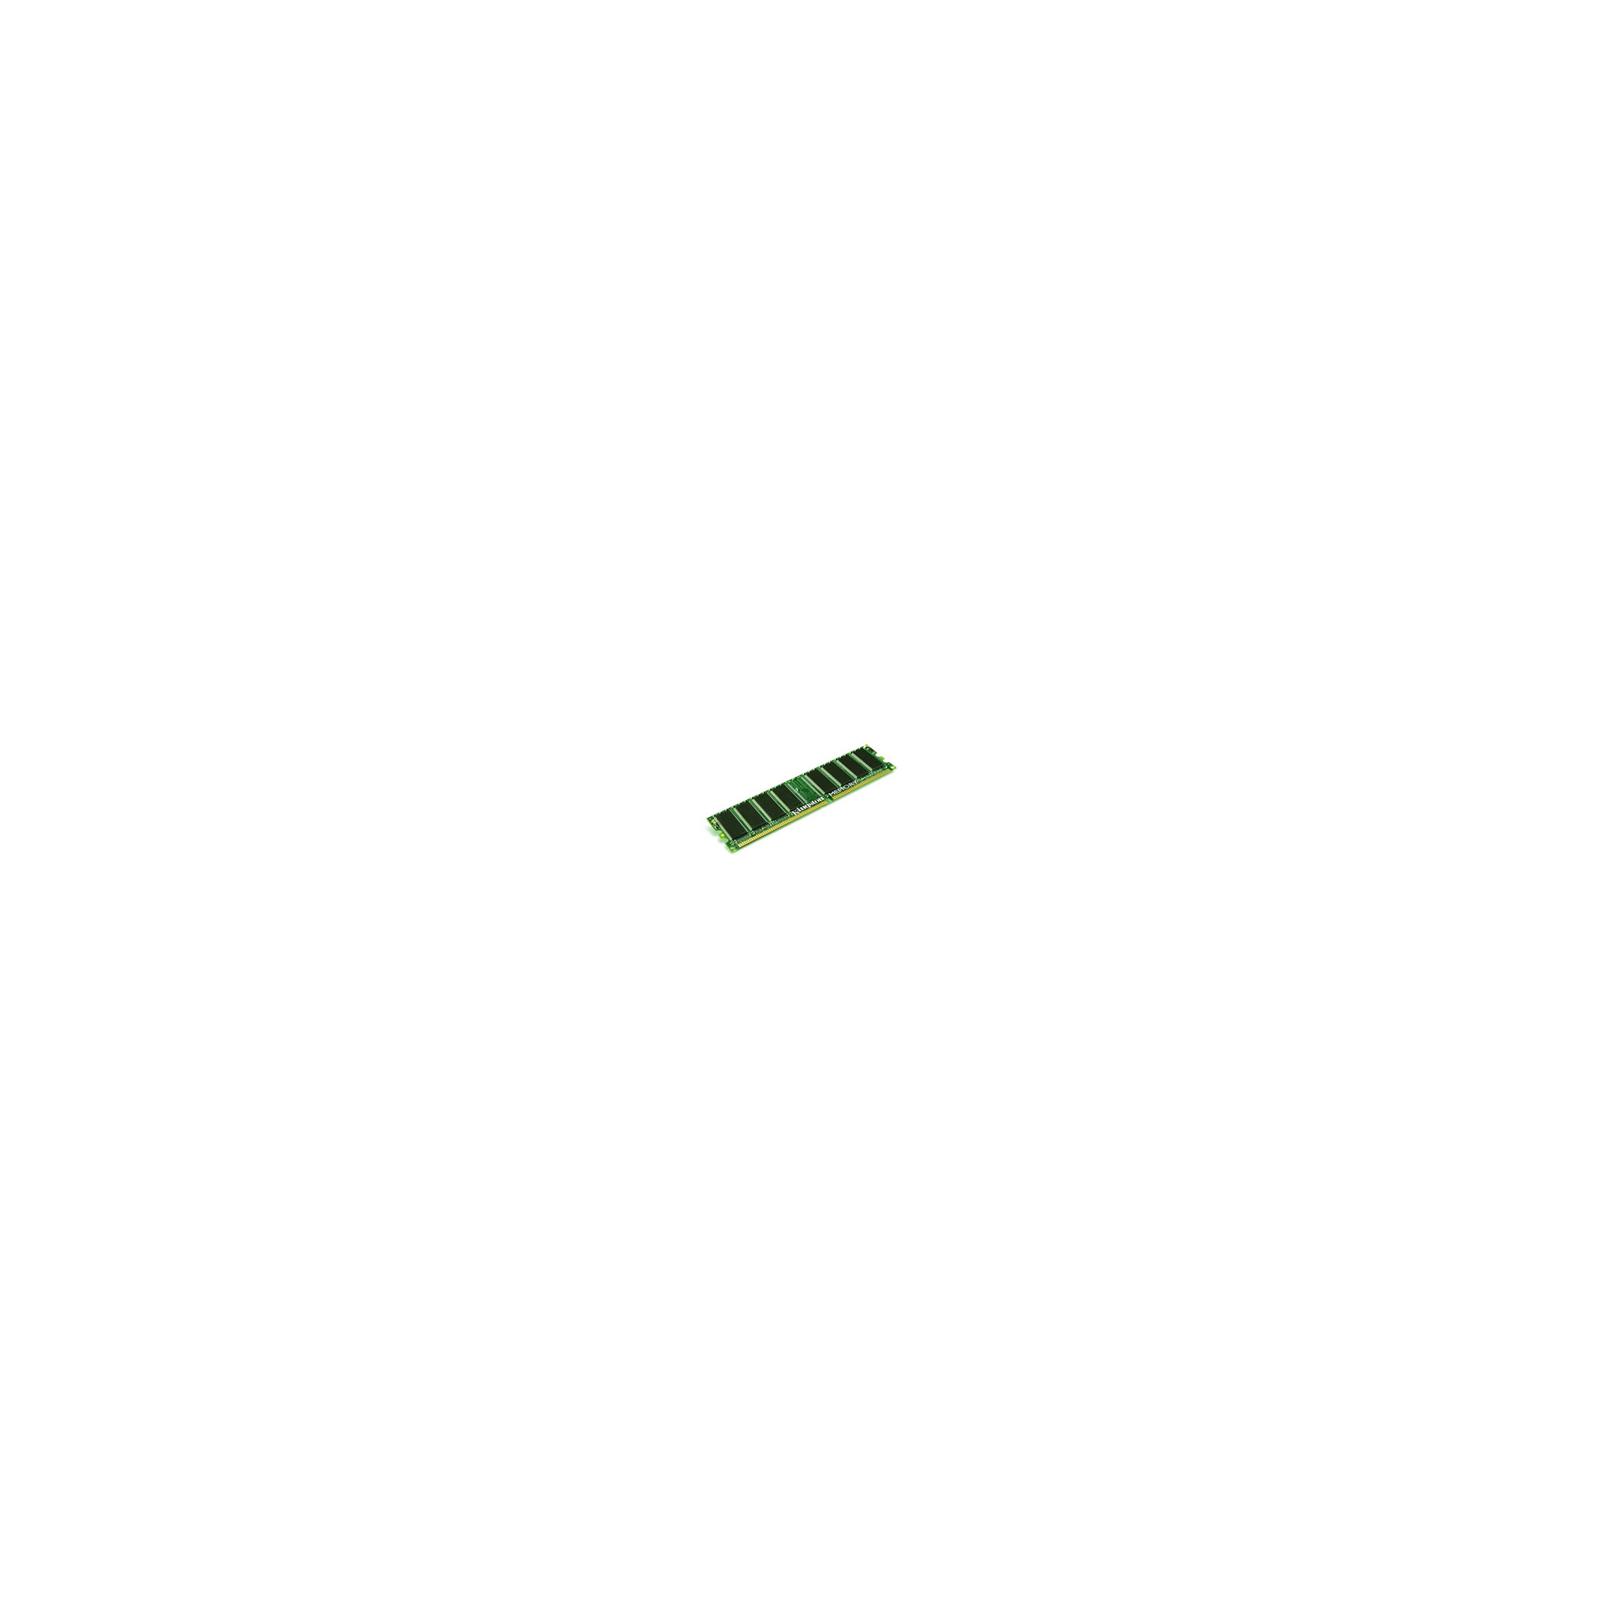 Модуль памяти для компьютера DDR SDRAM 512MB 400 MHz Samsung (Original)